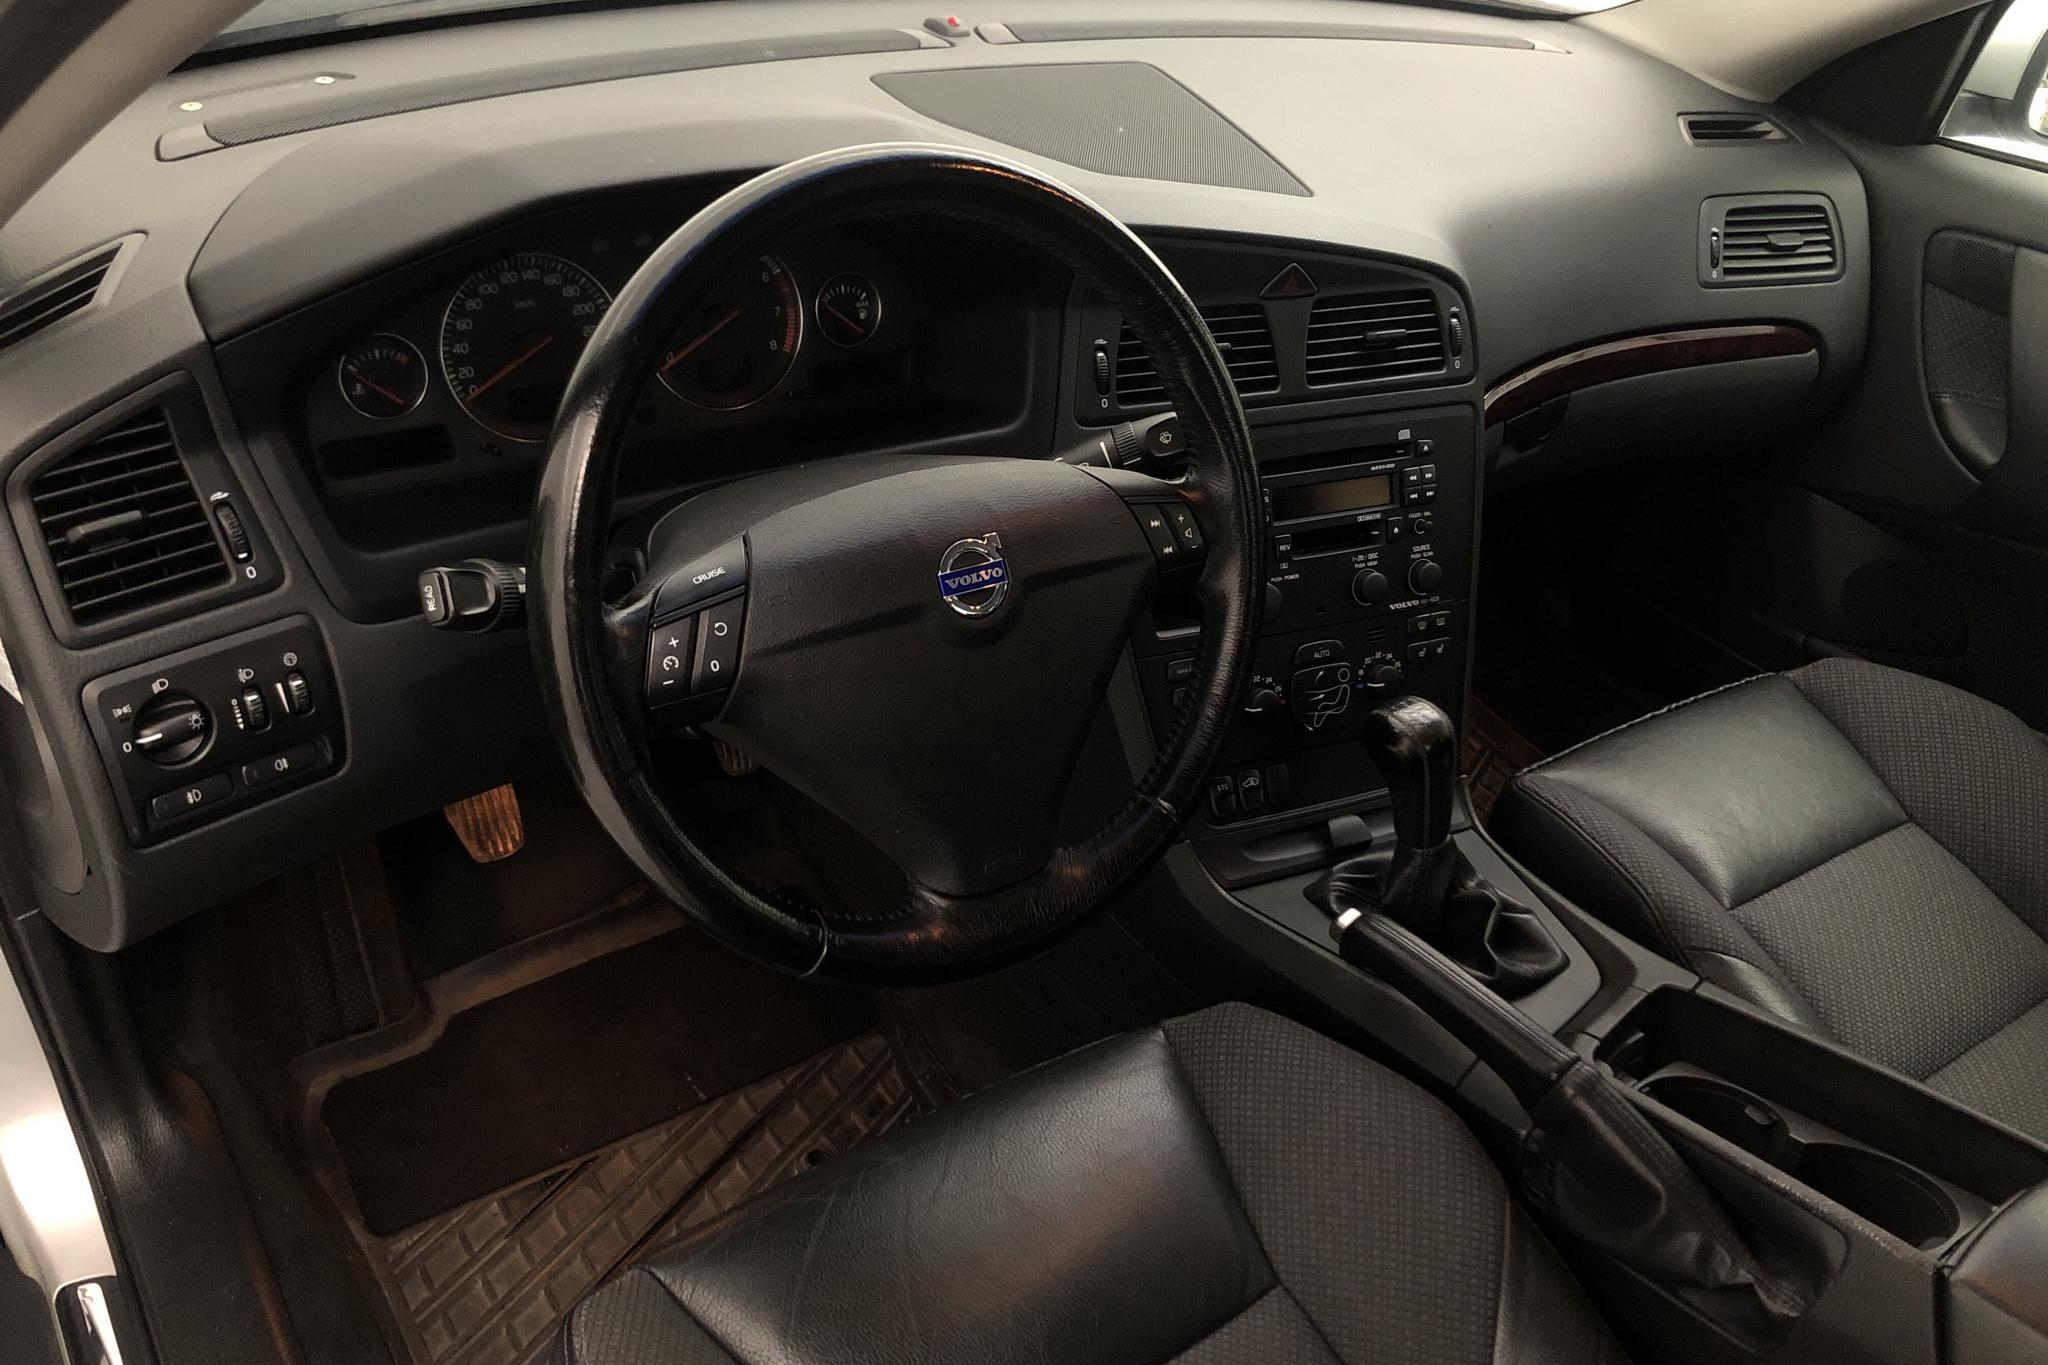 Volvo S60 2.4 (170hk) - 17 335 mil - Manuell - Light Grey - 2004